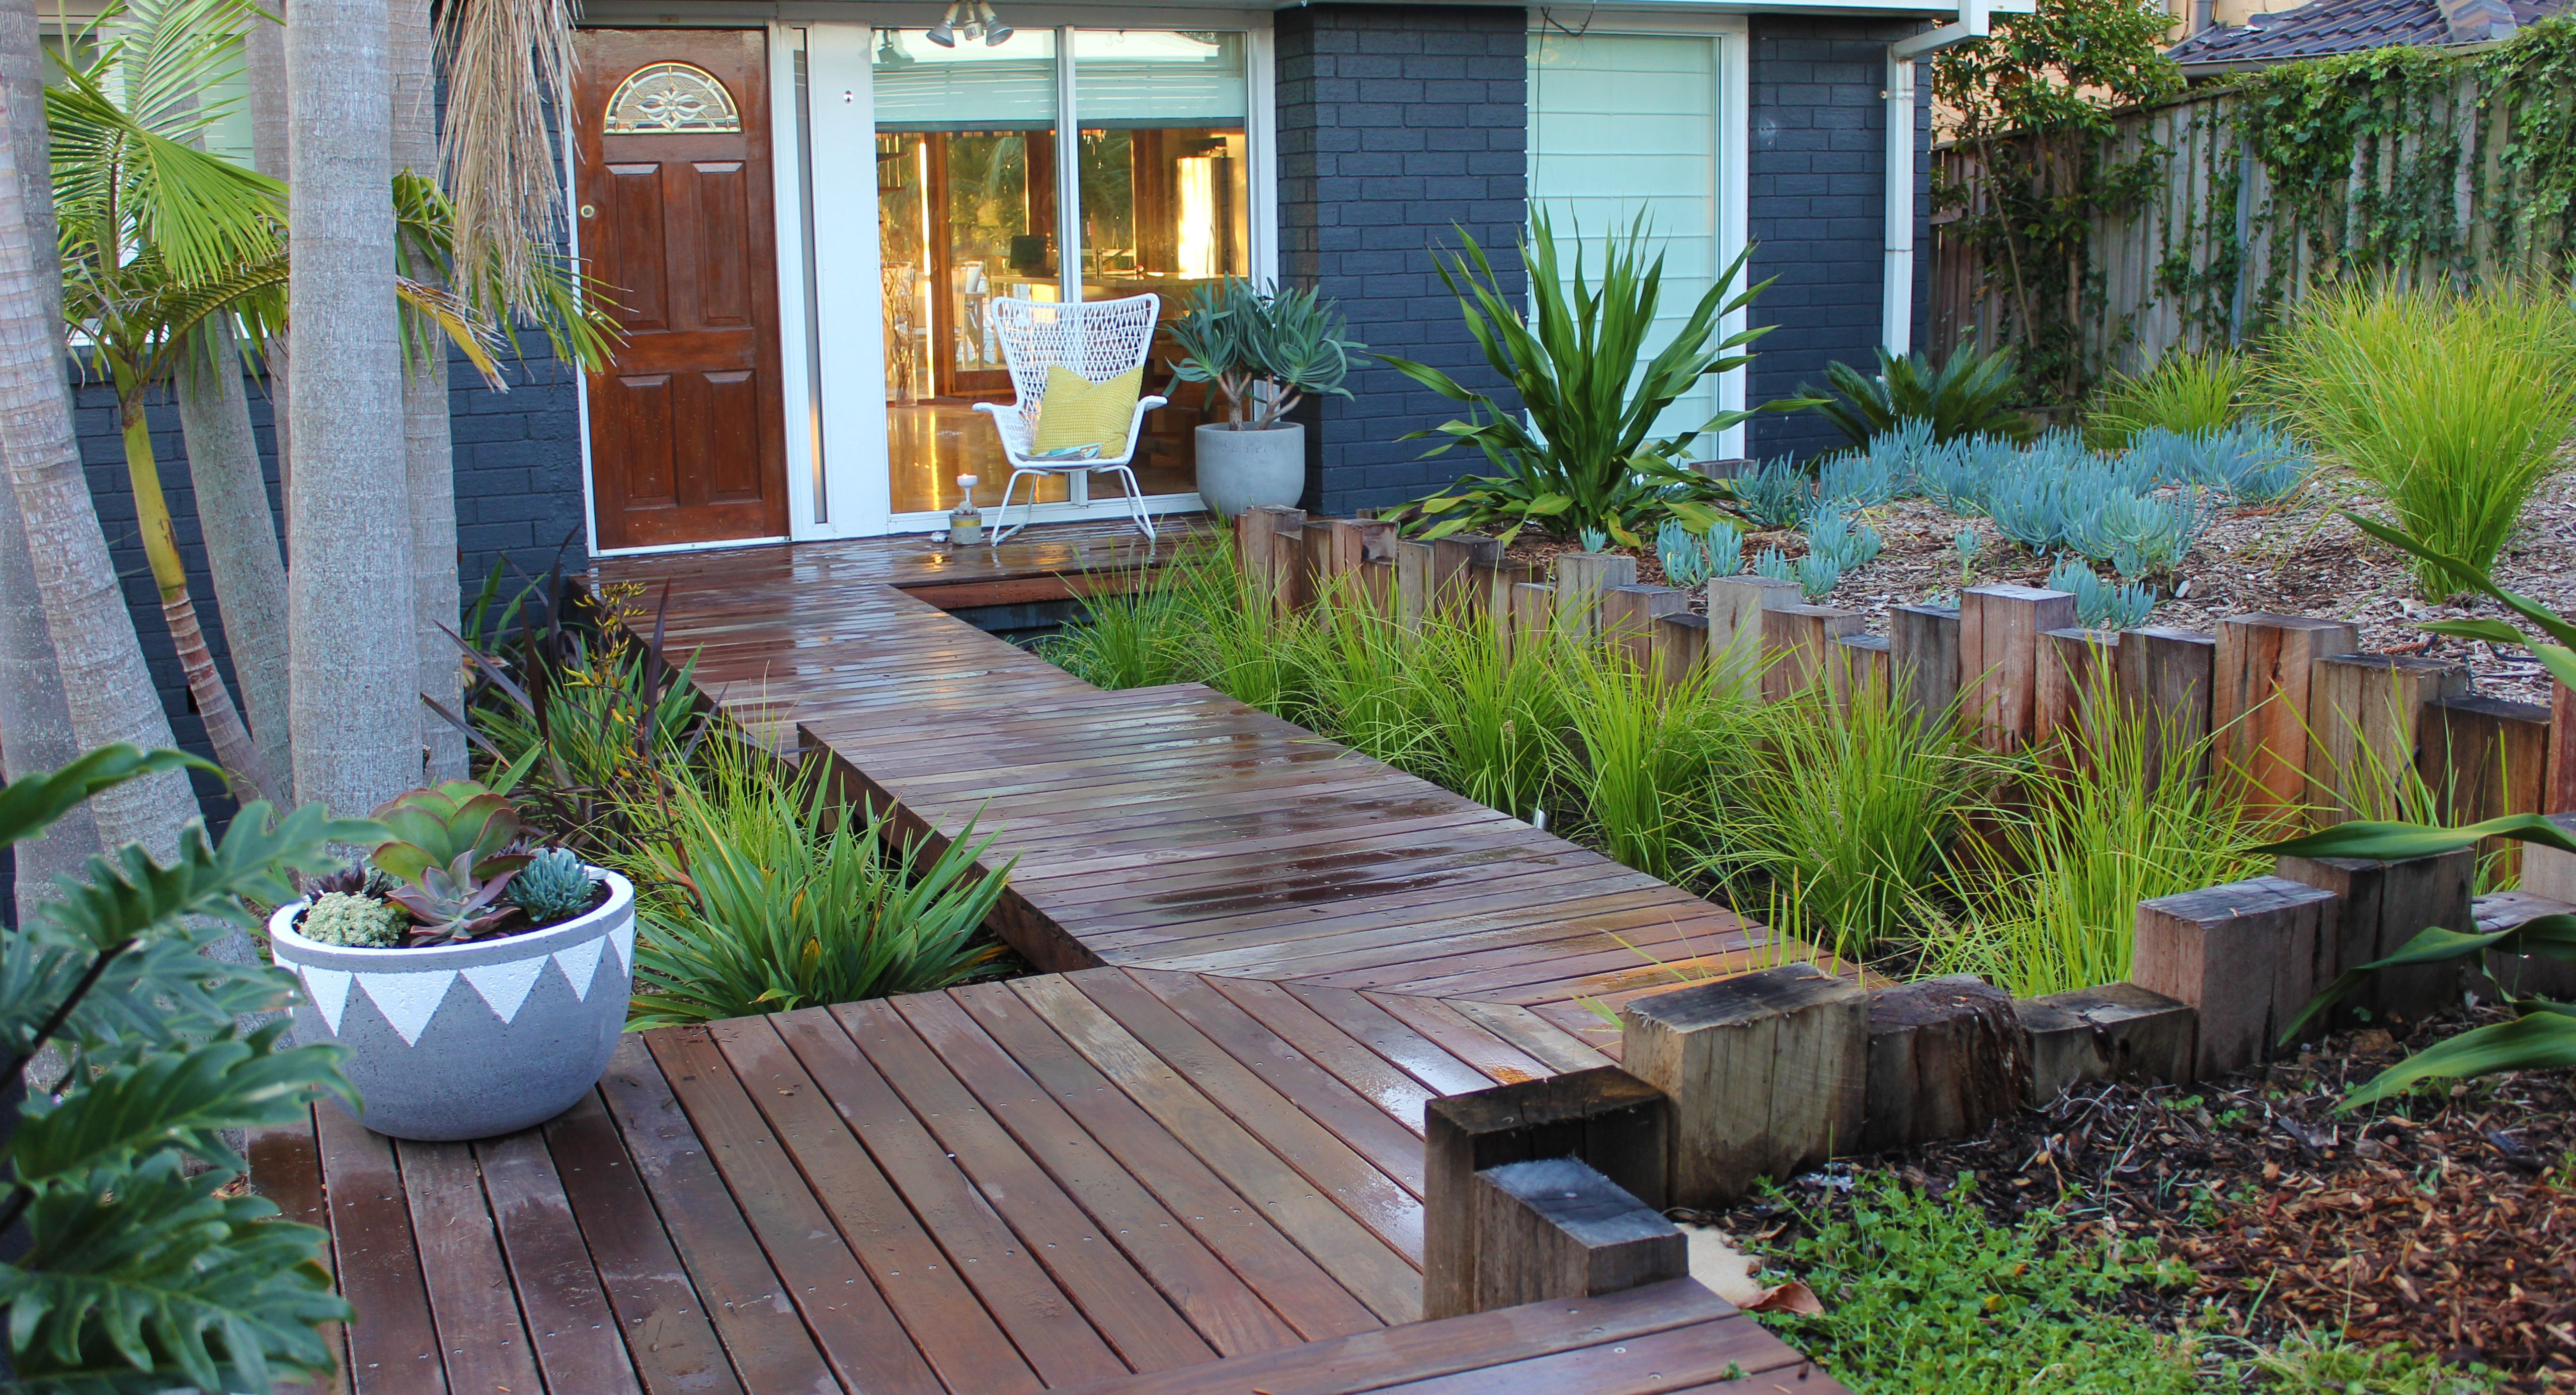 Newport residence, landscape, landscape design, coastal gardens, beach side gardens, timber boardwalk